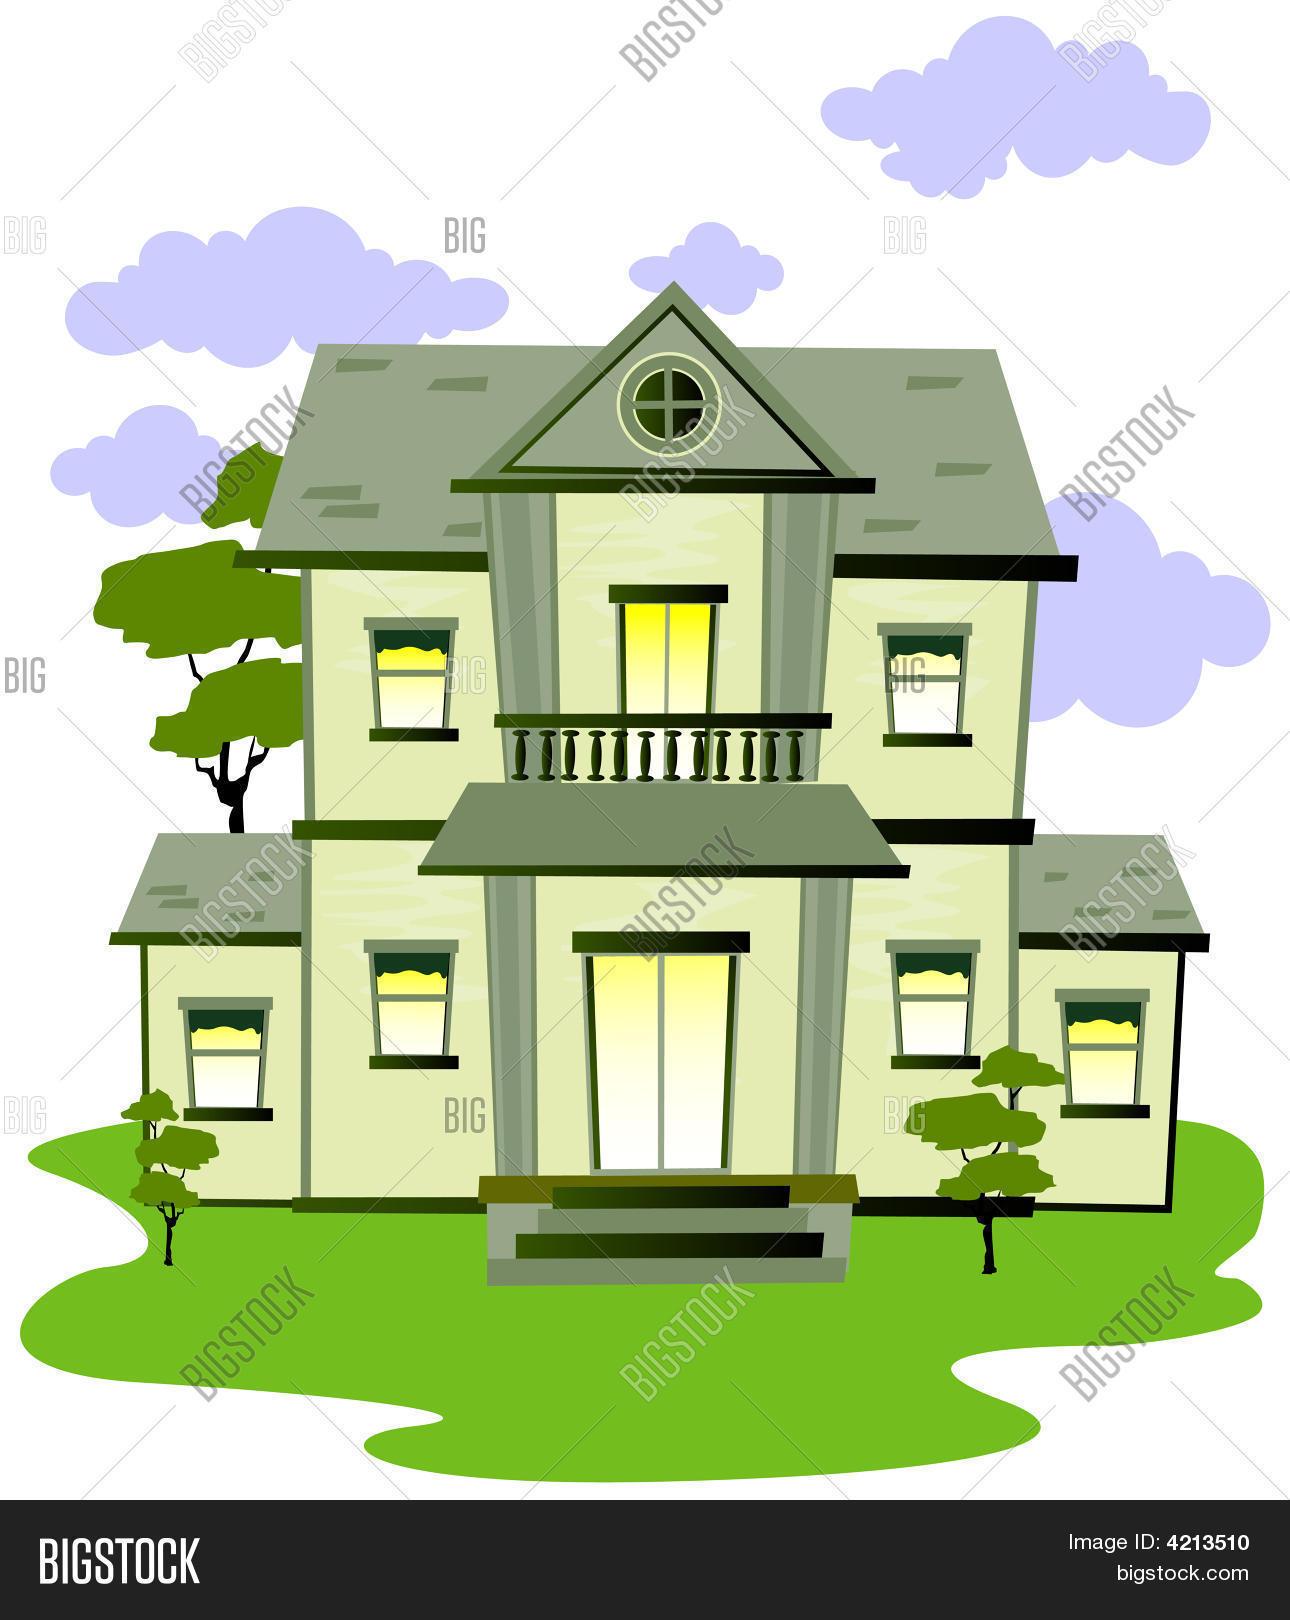 Cartoon House Image Photo Bigstock - Big cartoon house